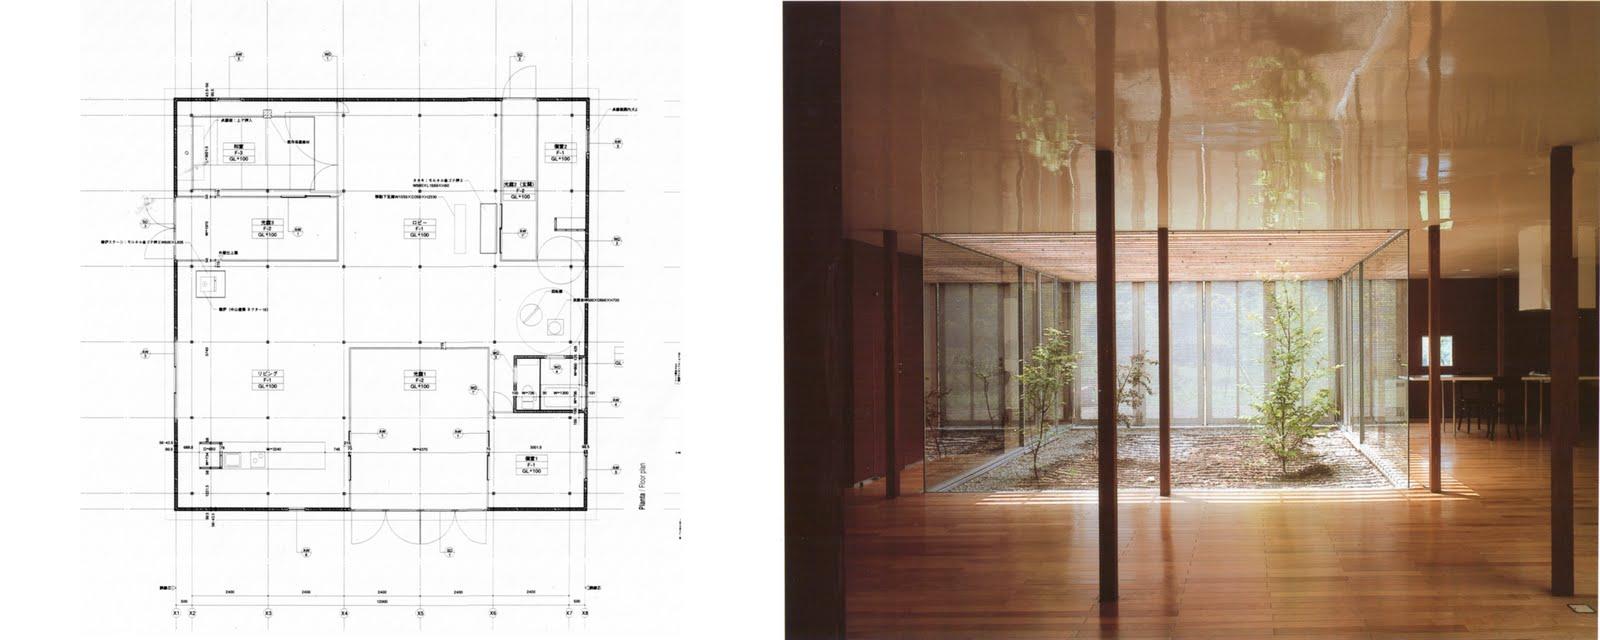 Catedra sgbl arq roberto amette arquitectura 1 ejercicio - Casas para fines de semana ...